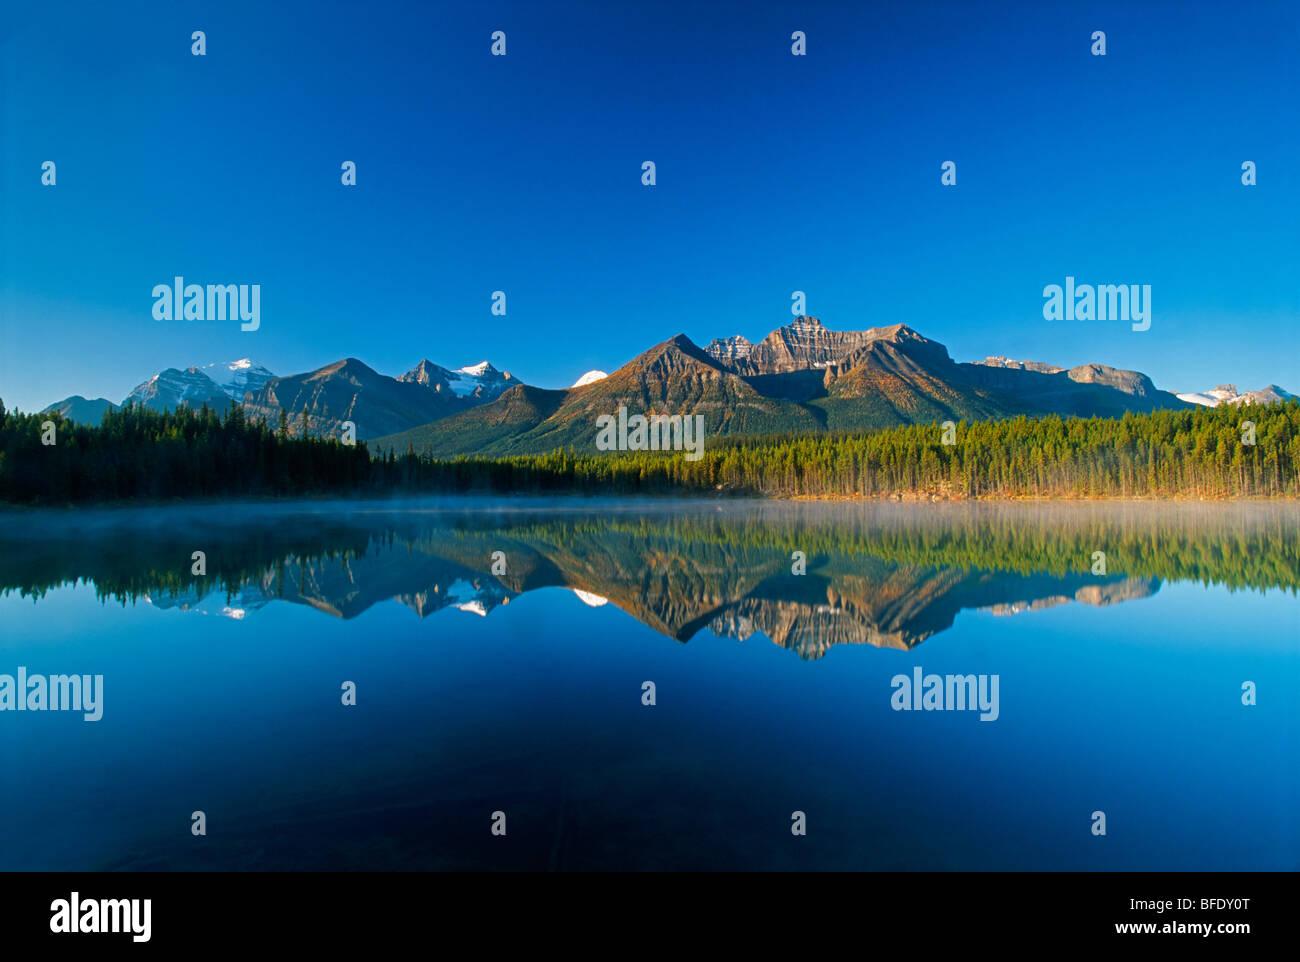 Mountain reflection in Herbert Lake, Banff National Park, Alberta, Canada - Stock Image